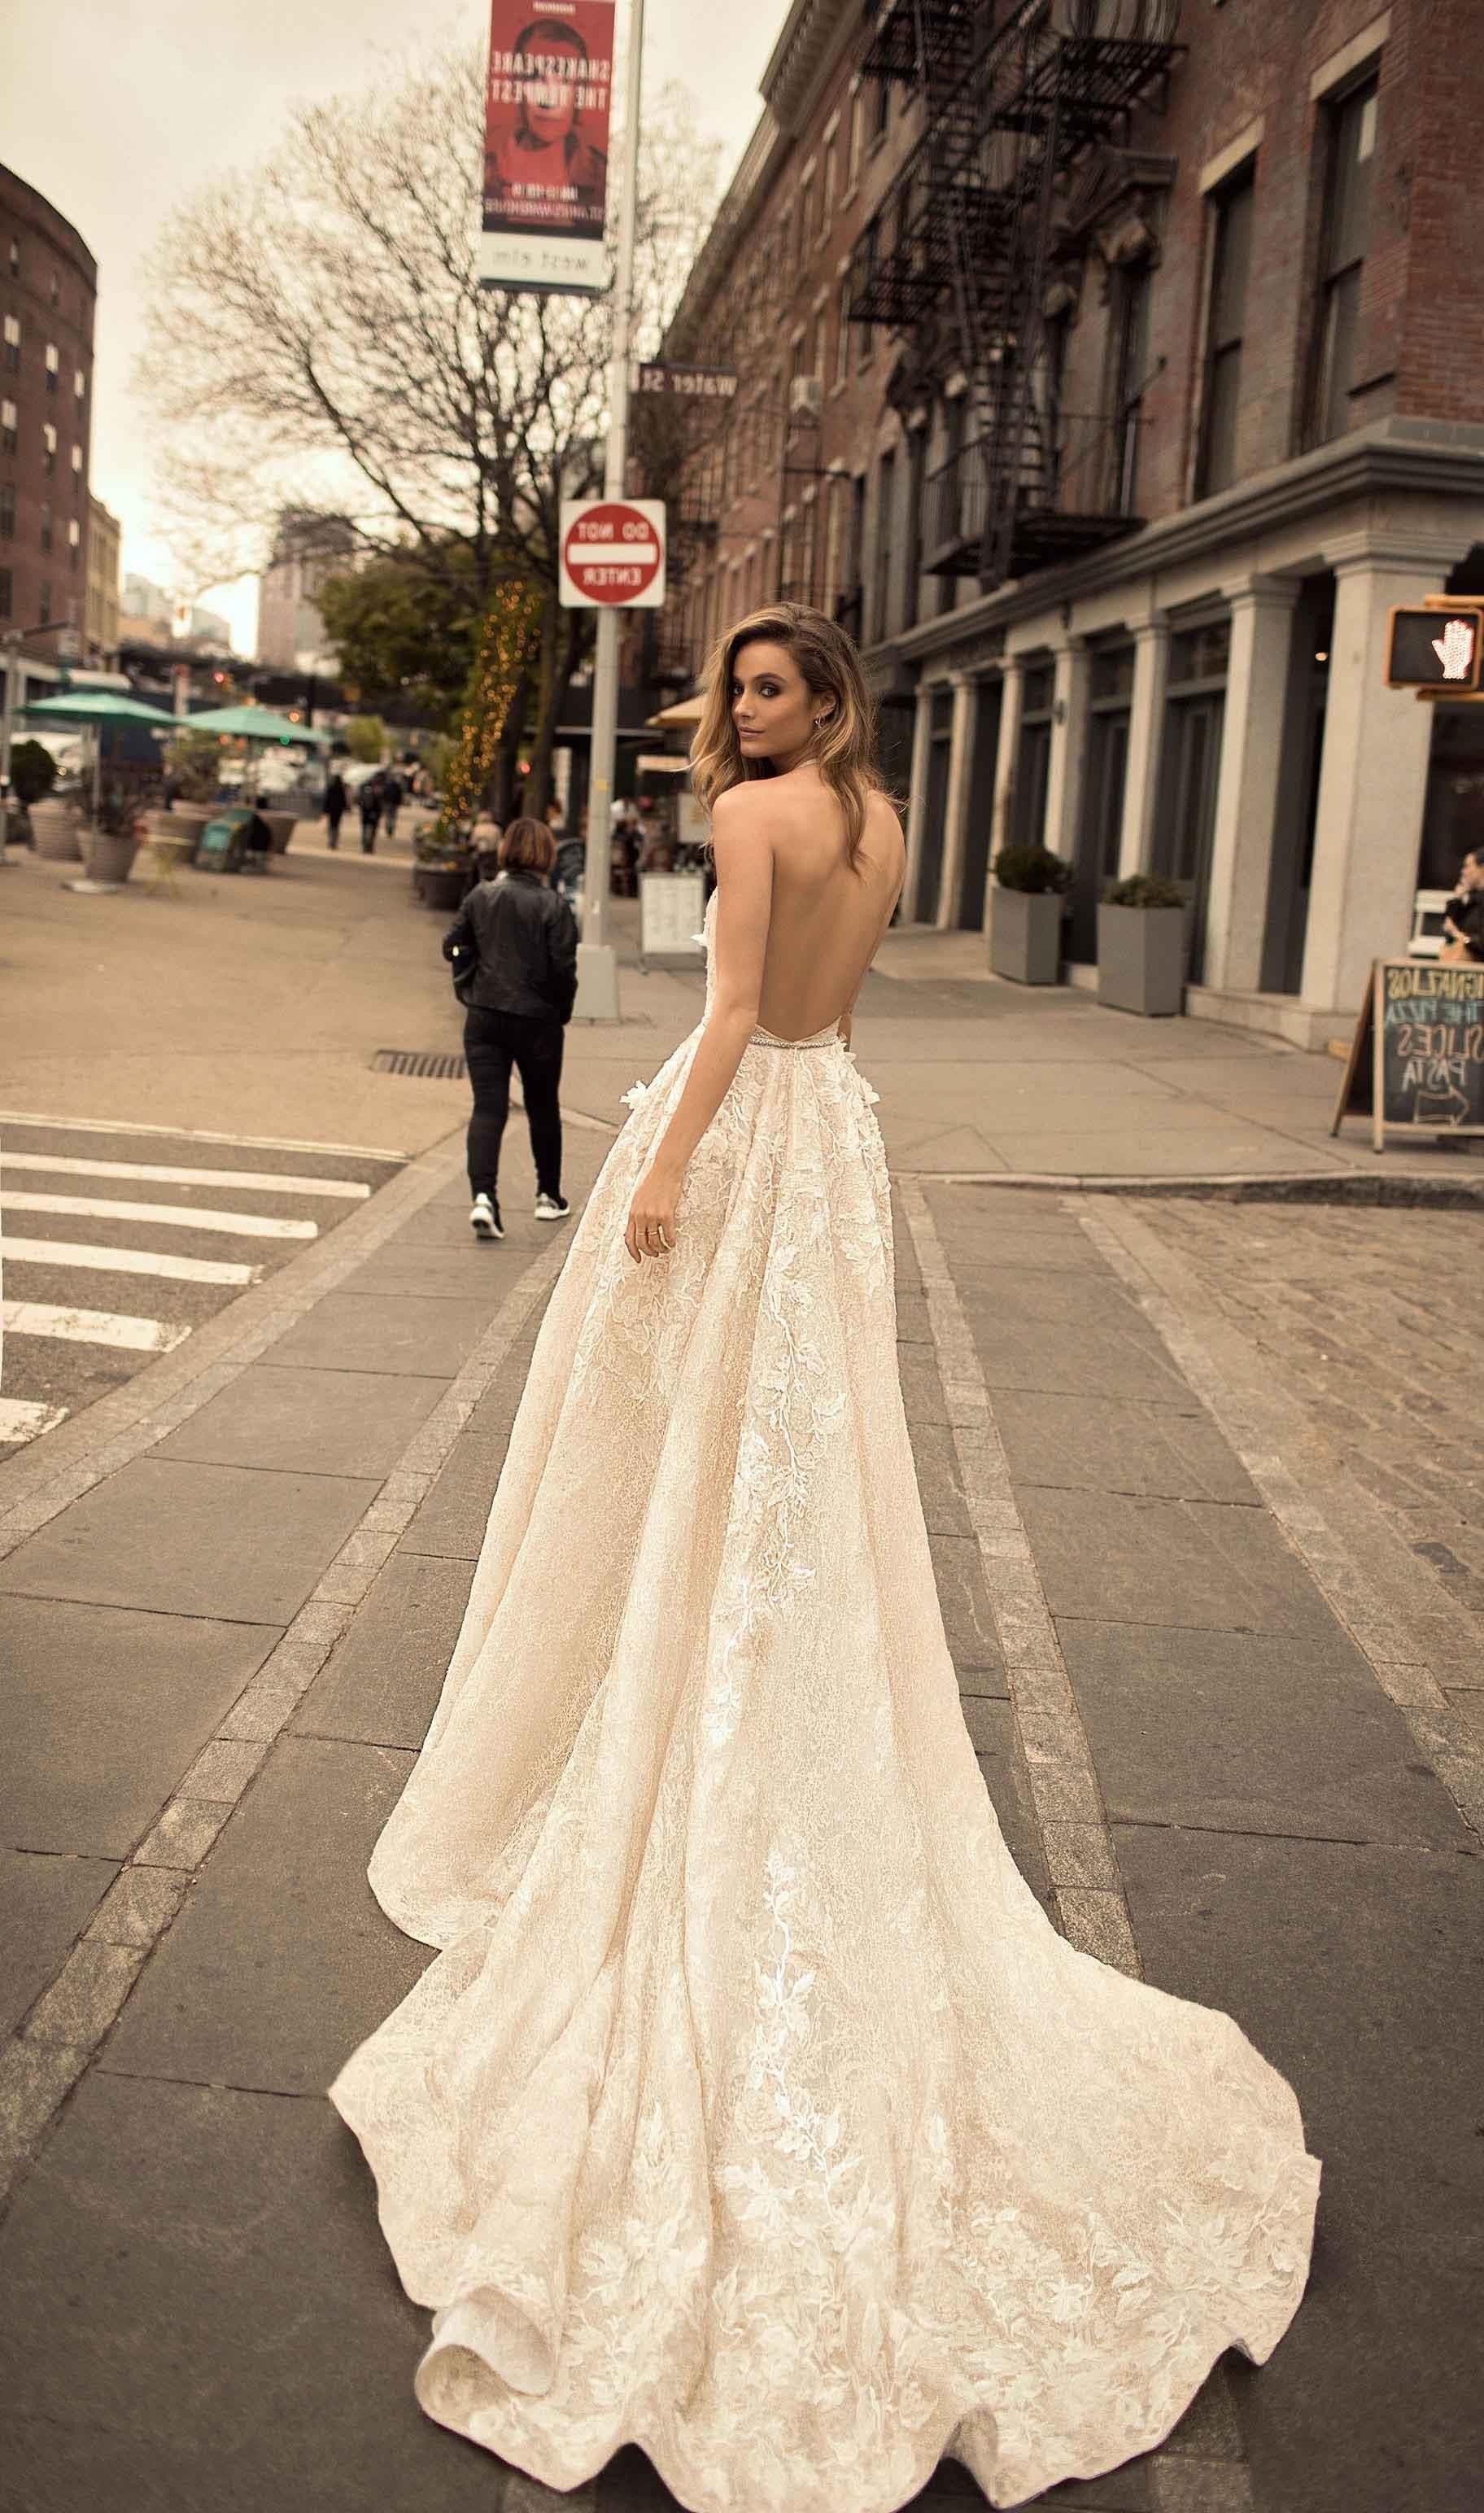 Bentuk Bridesmaid Dress Hijab E9dx Wedding Ideas White and Gold Wedding Dress the Newest